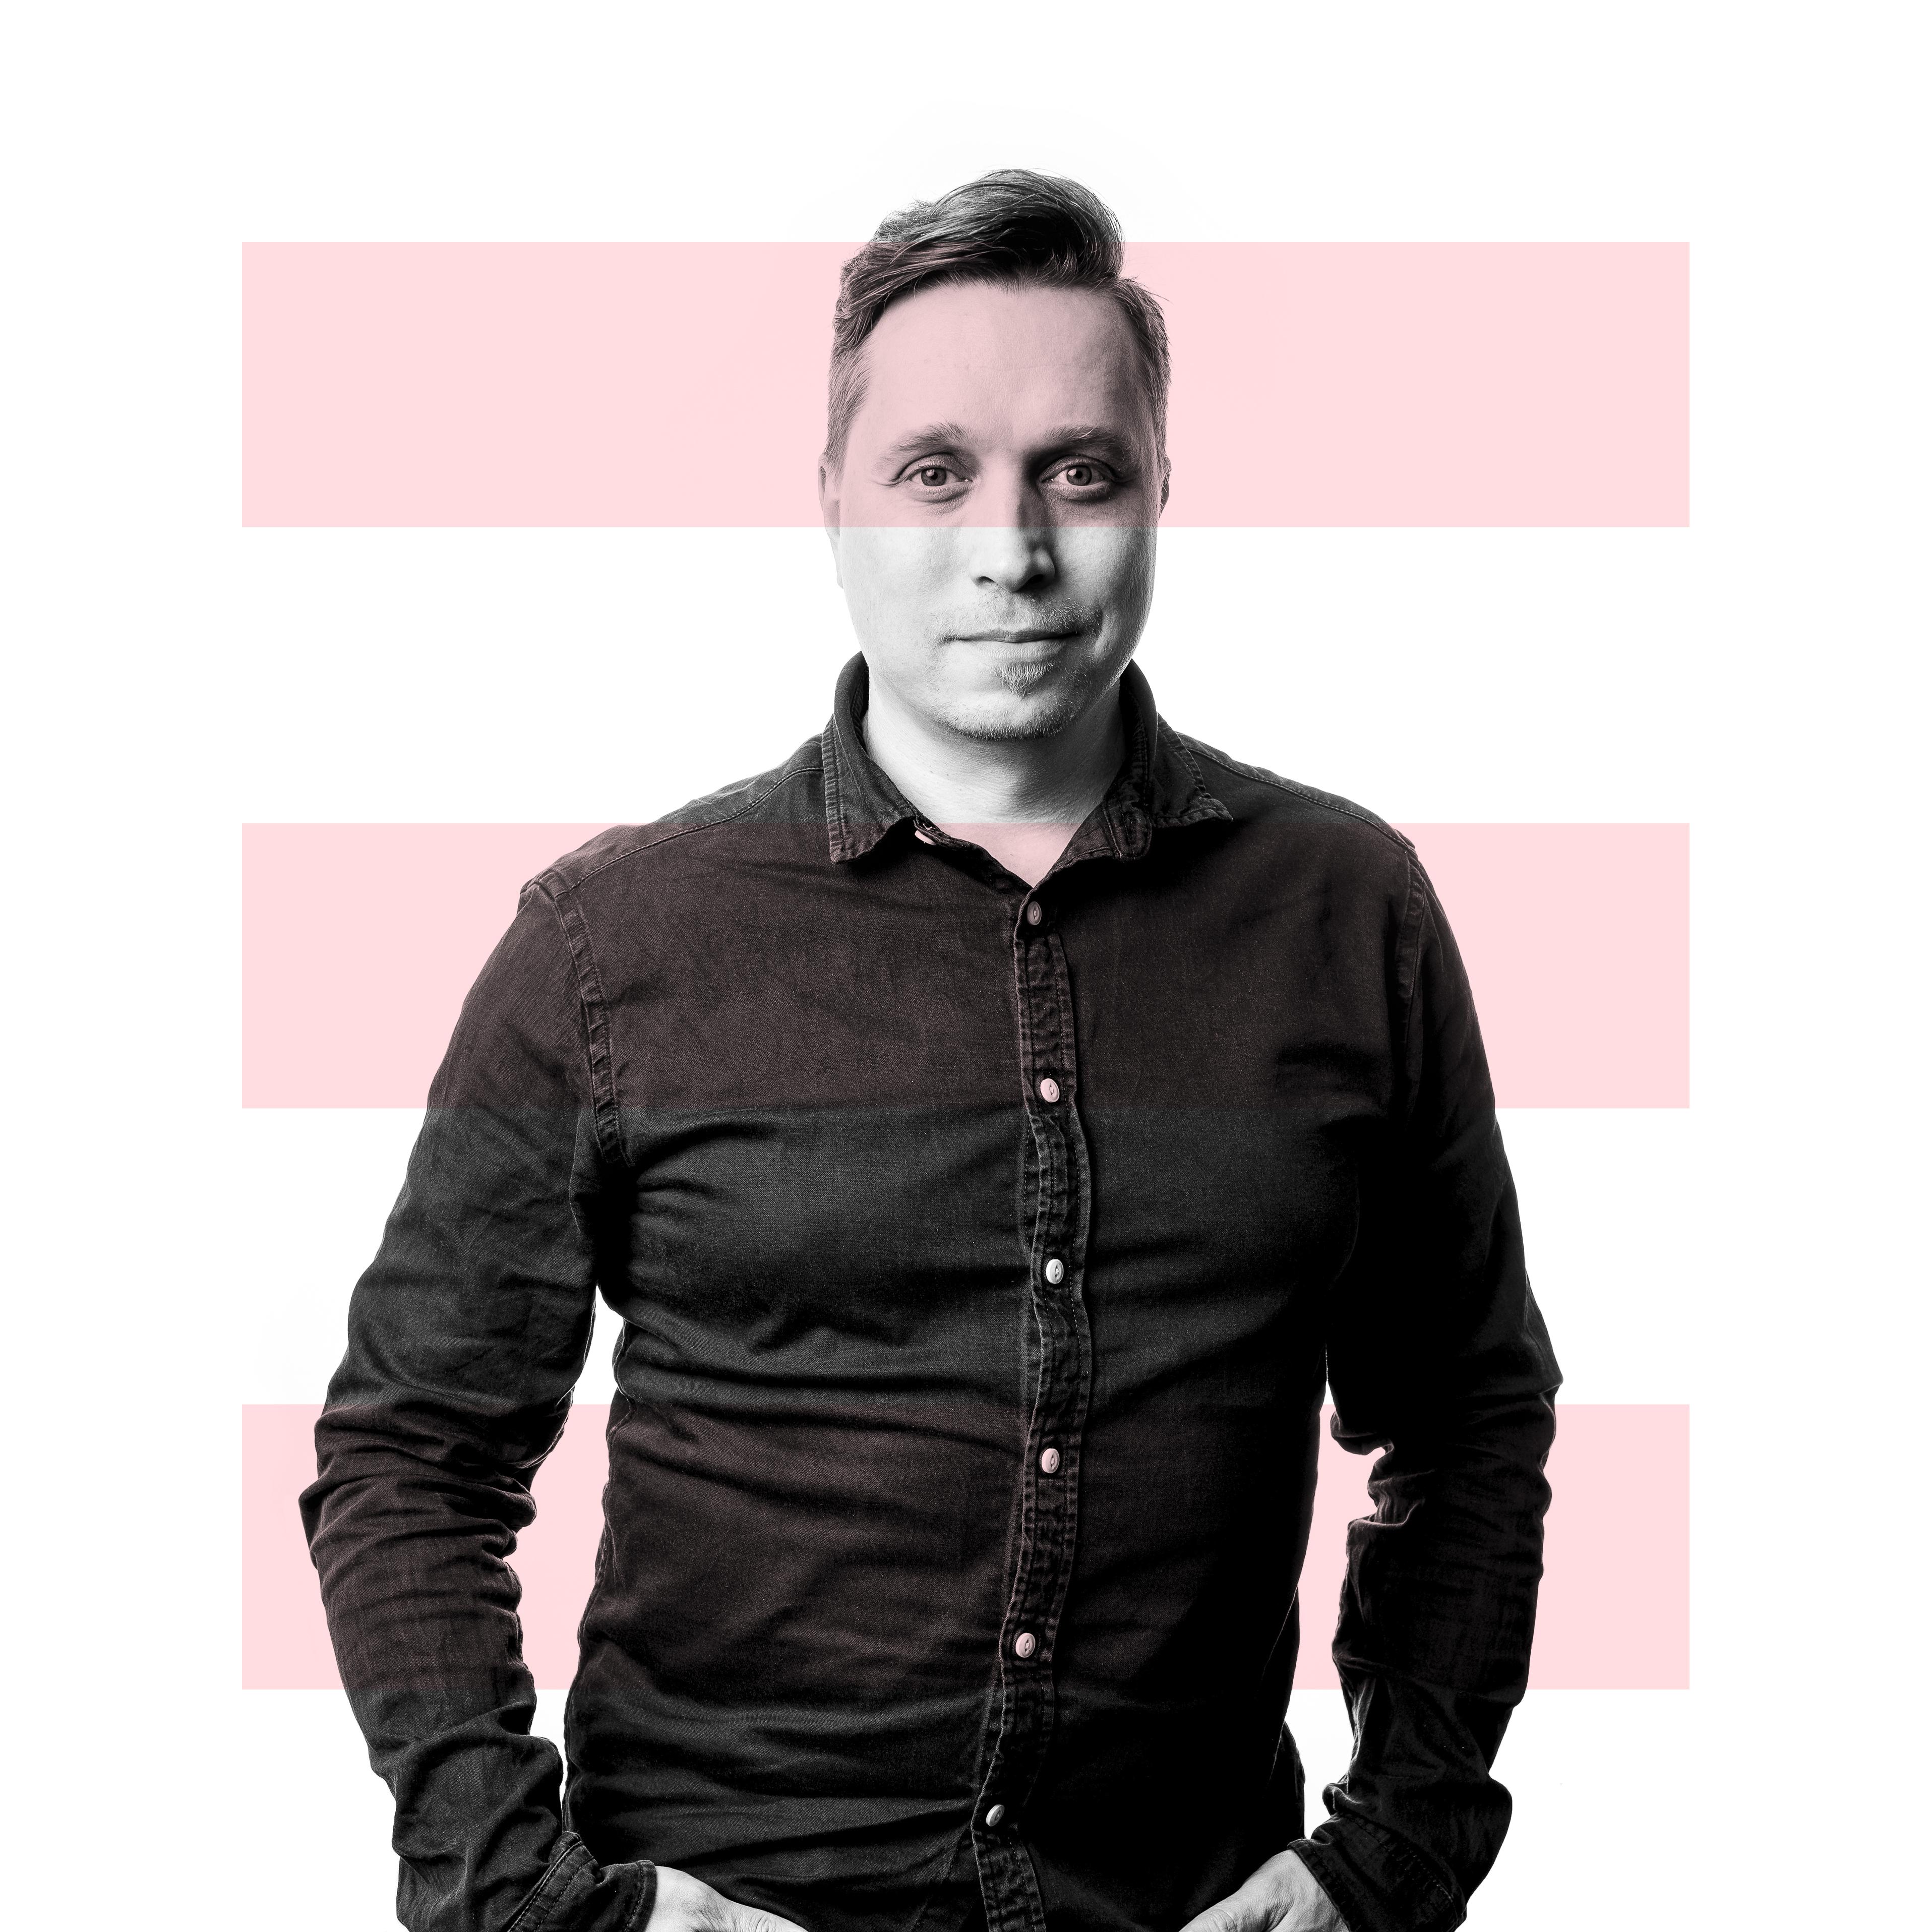 Image showing Mikko Nisula